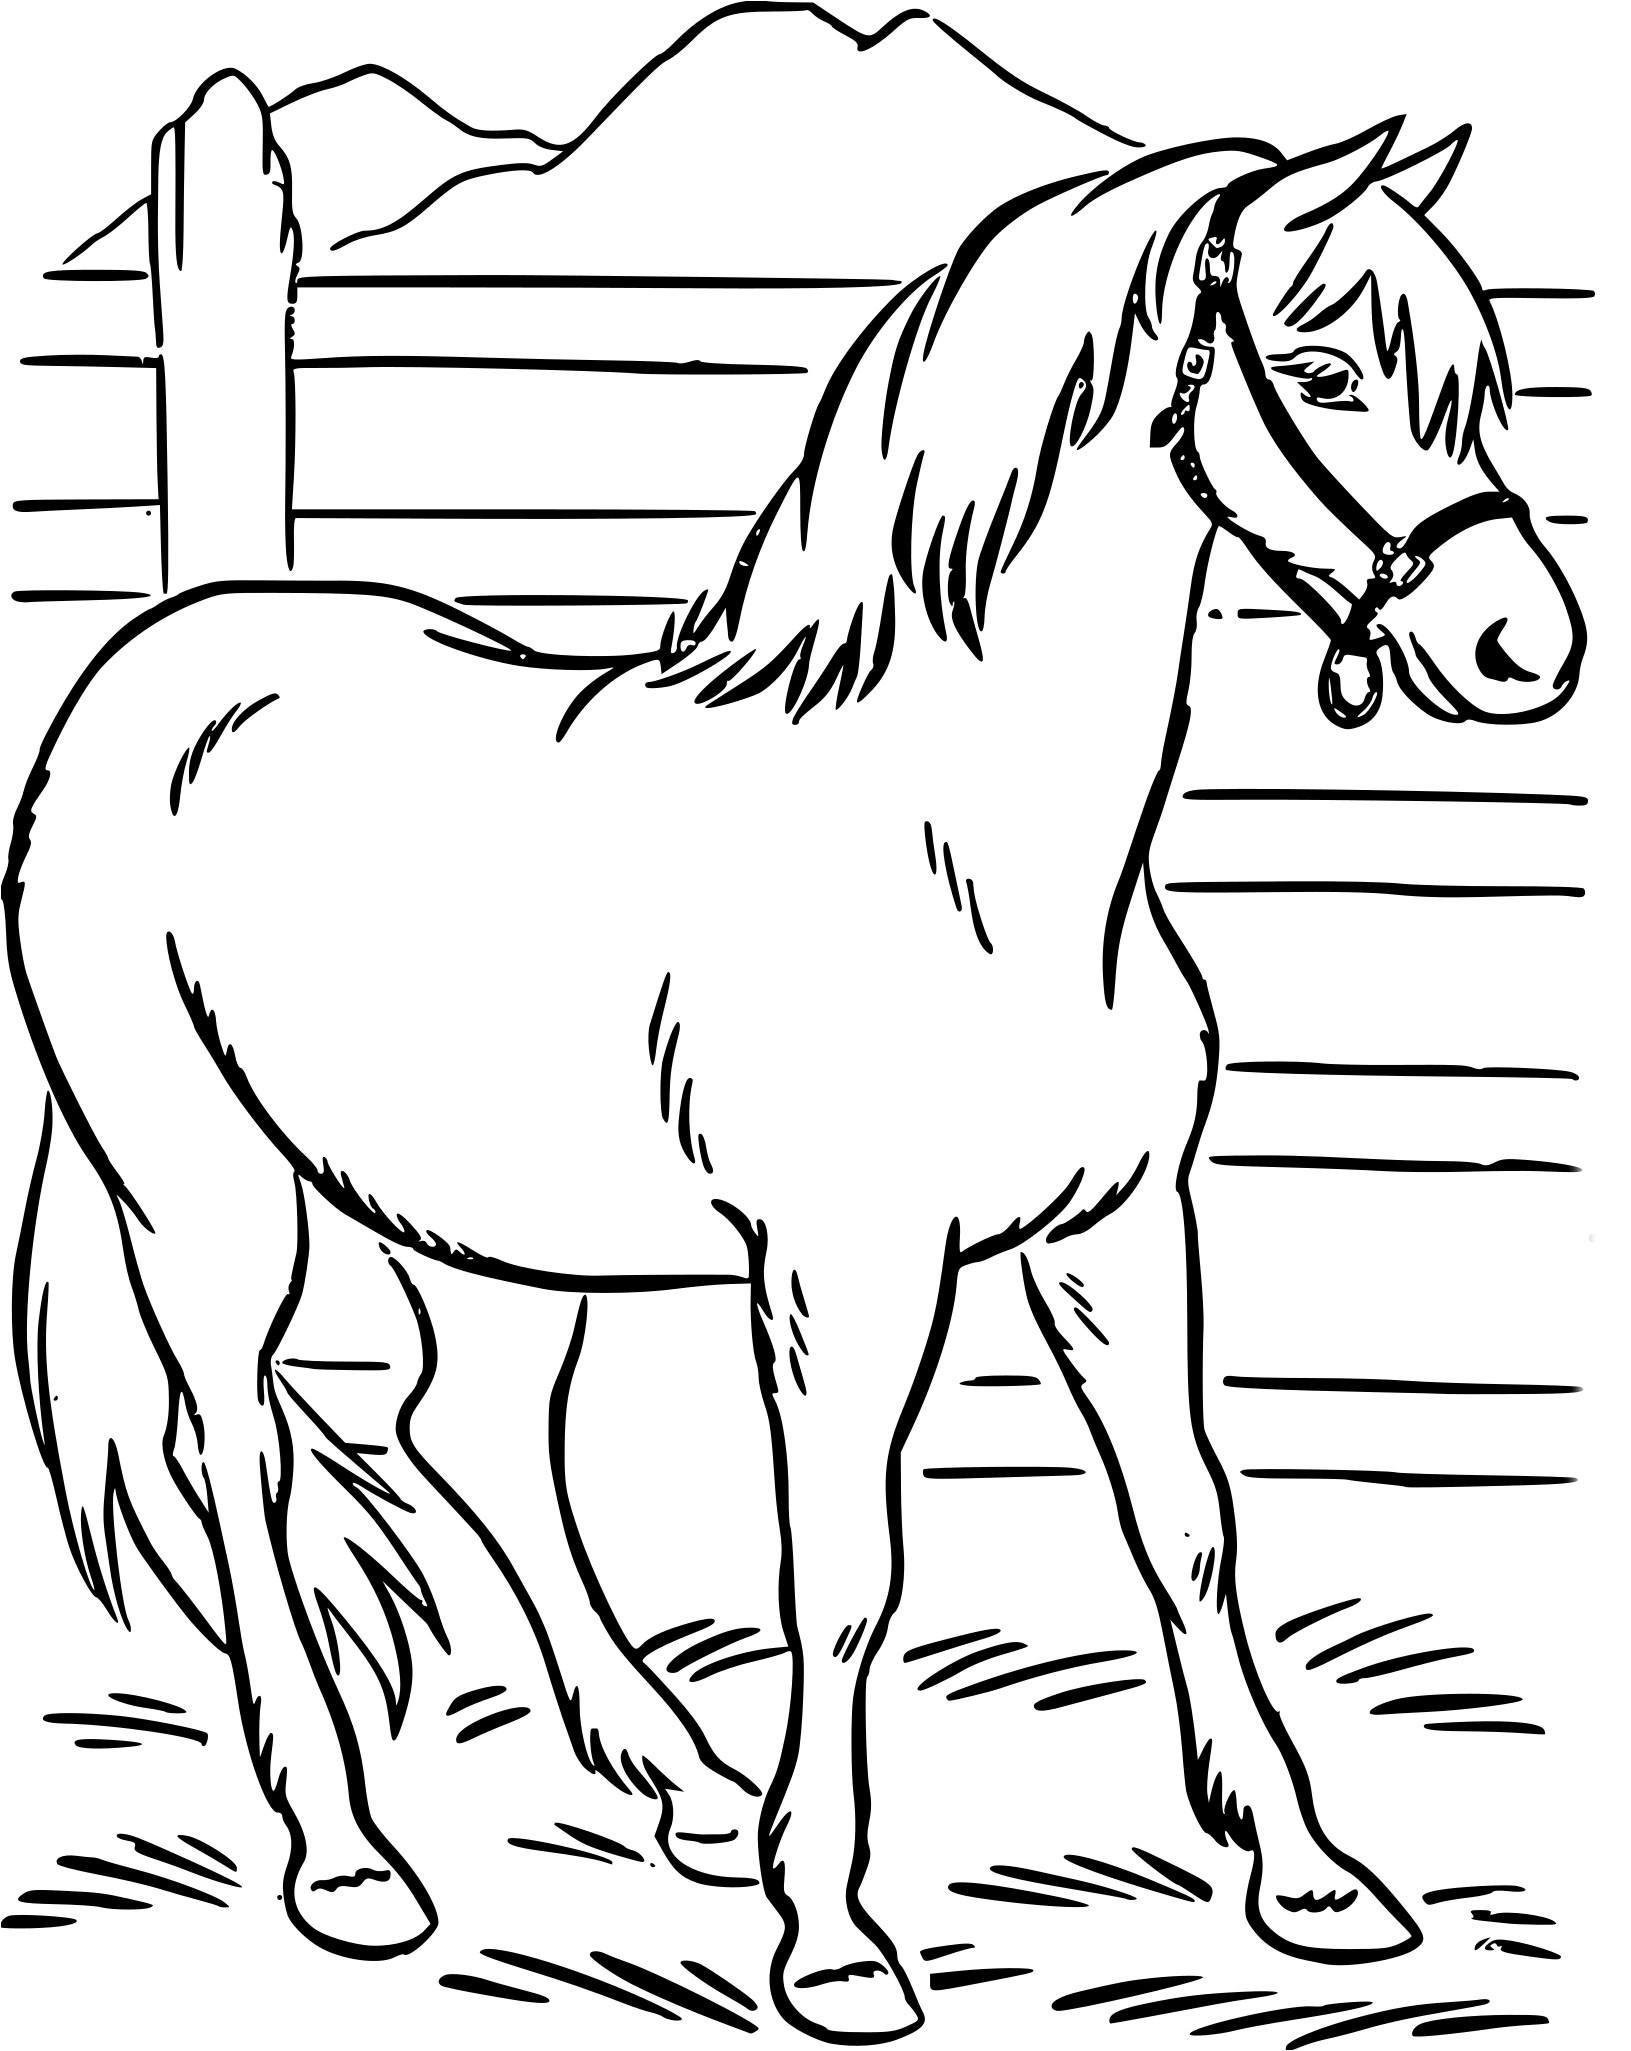 Coloriage Chevaux A Imprimer Coloriage Cheval 30 Brawler Decoloriage De Cheval A Imprimer Dieren Kleurplaten Paard Tekeningen Borduren Dieren